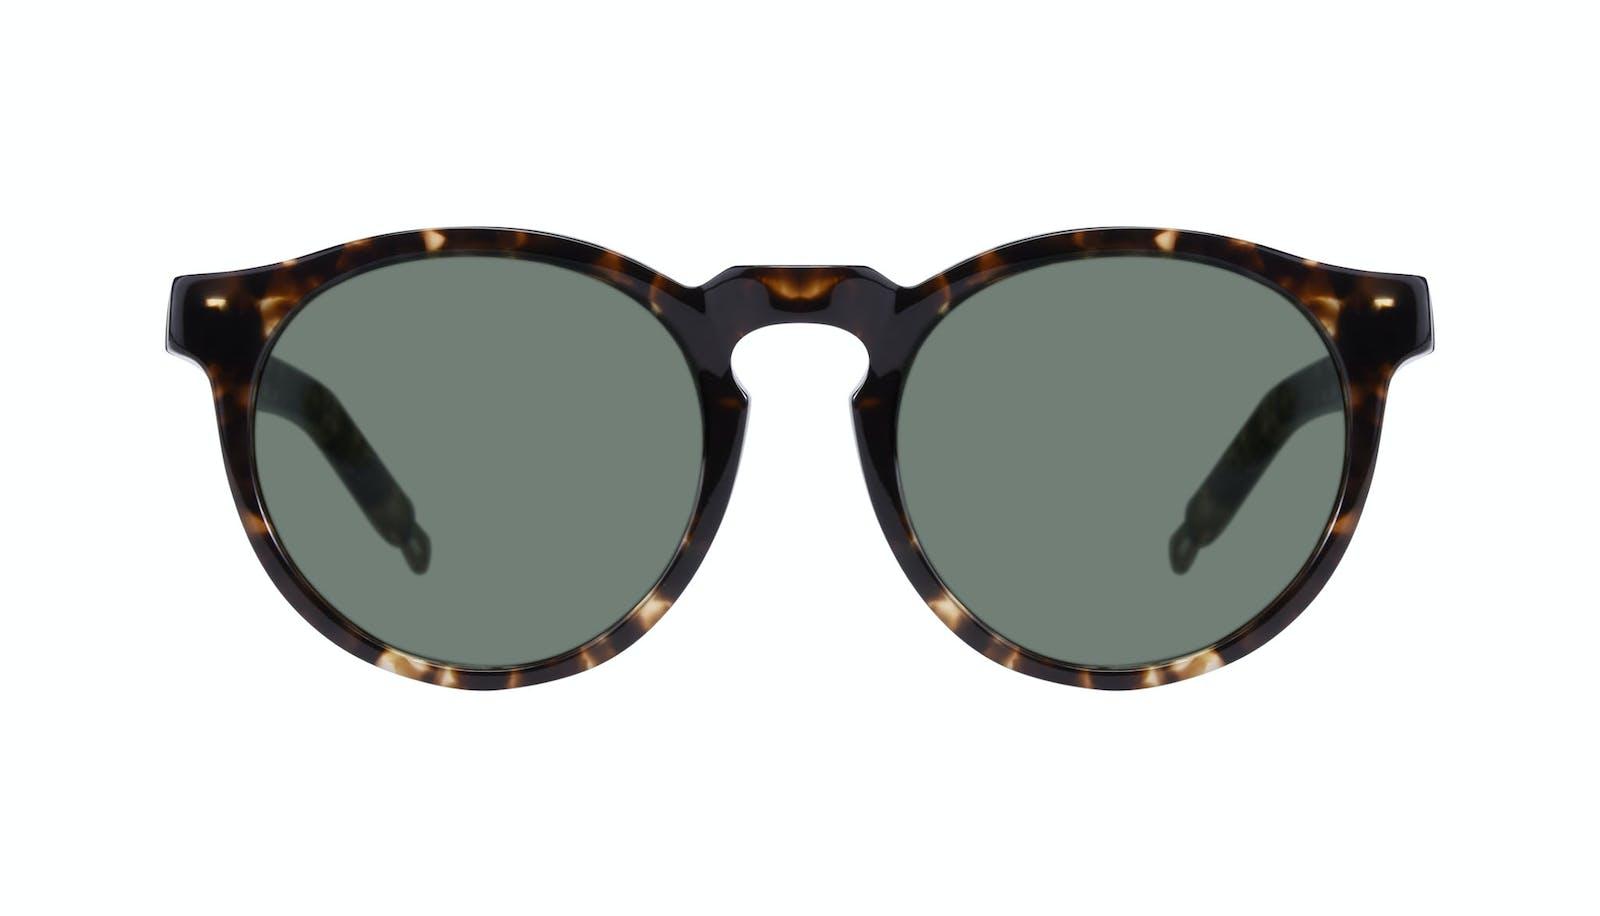 59da3b2147a Men s Sunglasses - Ace in Shadow